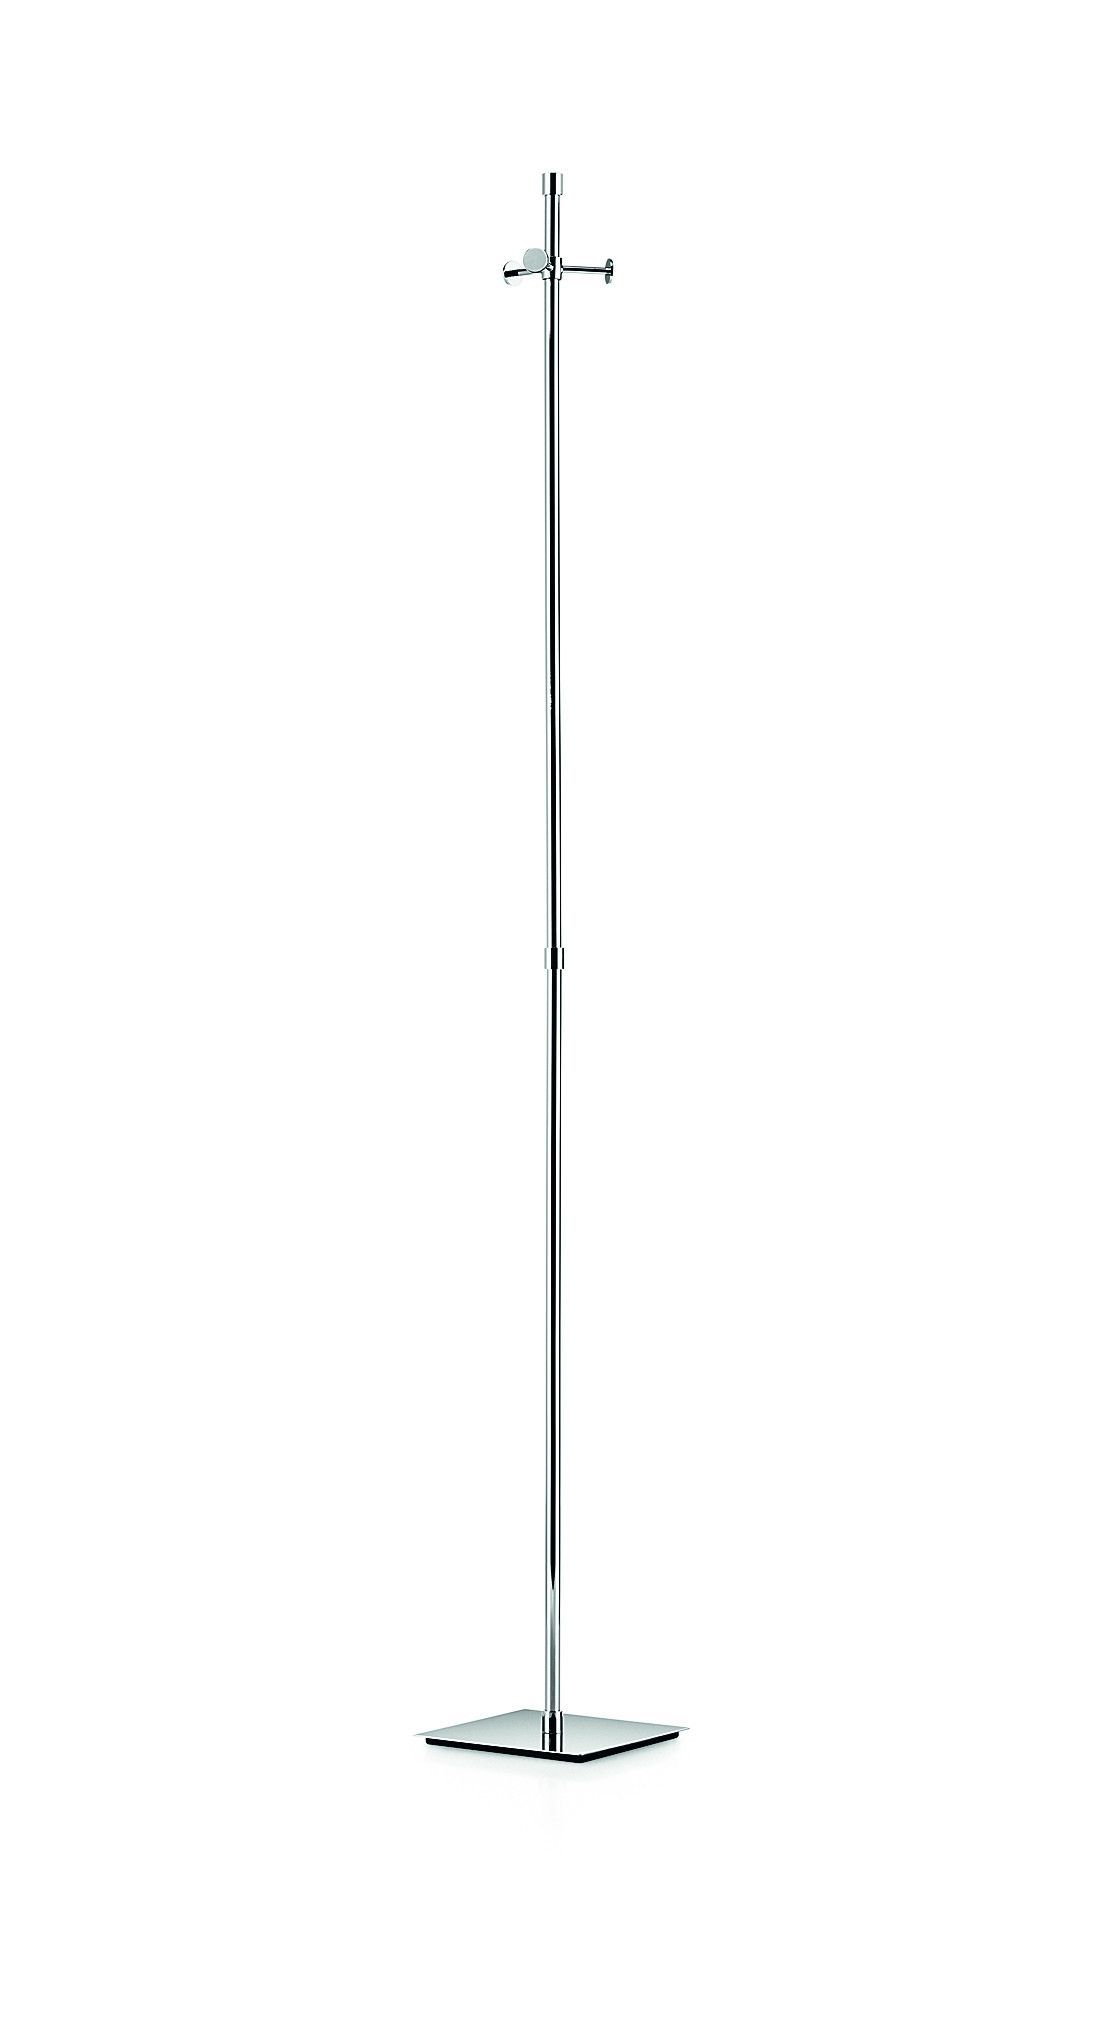 02480d0d0fb Linea Brass Metal Coat Rack Stand Tree Hanger Holder W  3 Hooks Square  Base